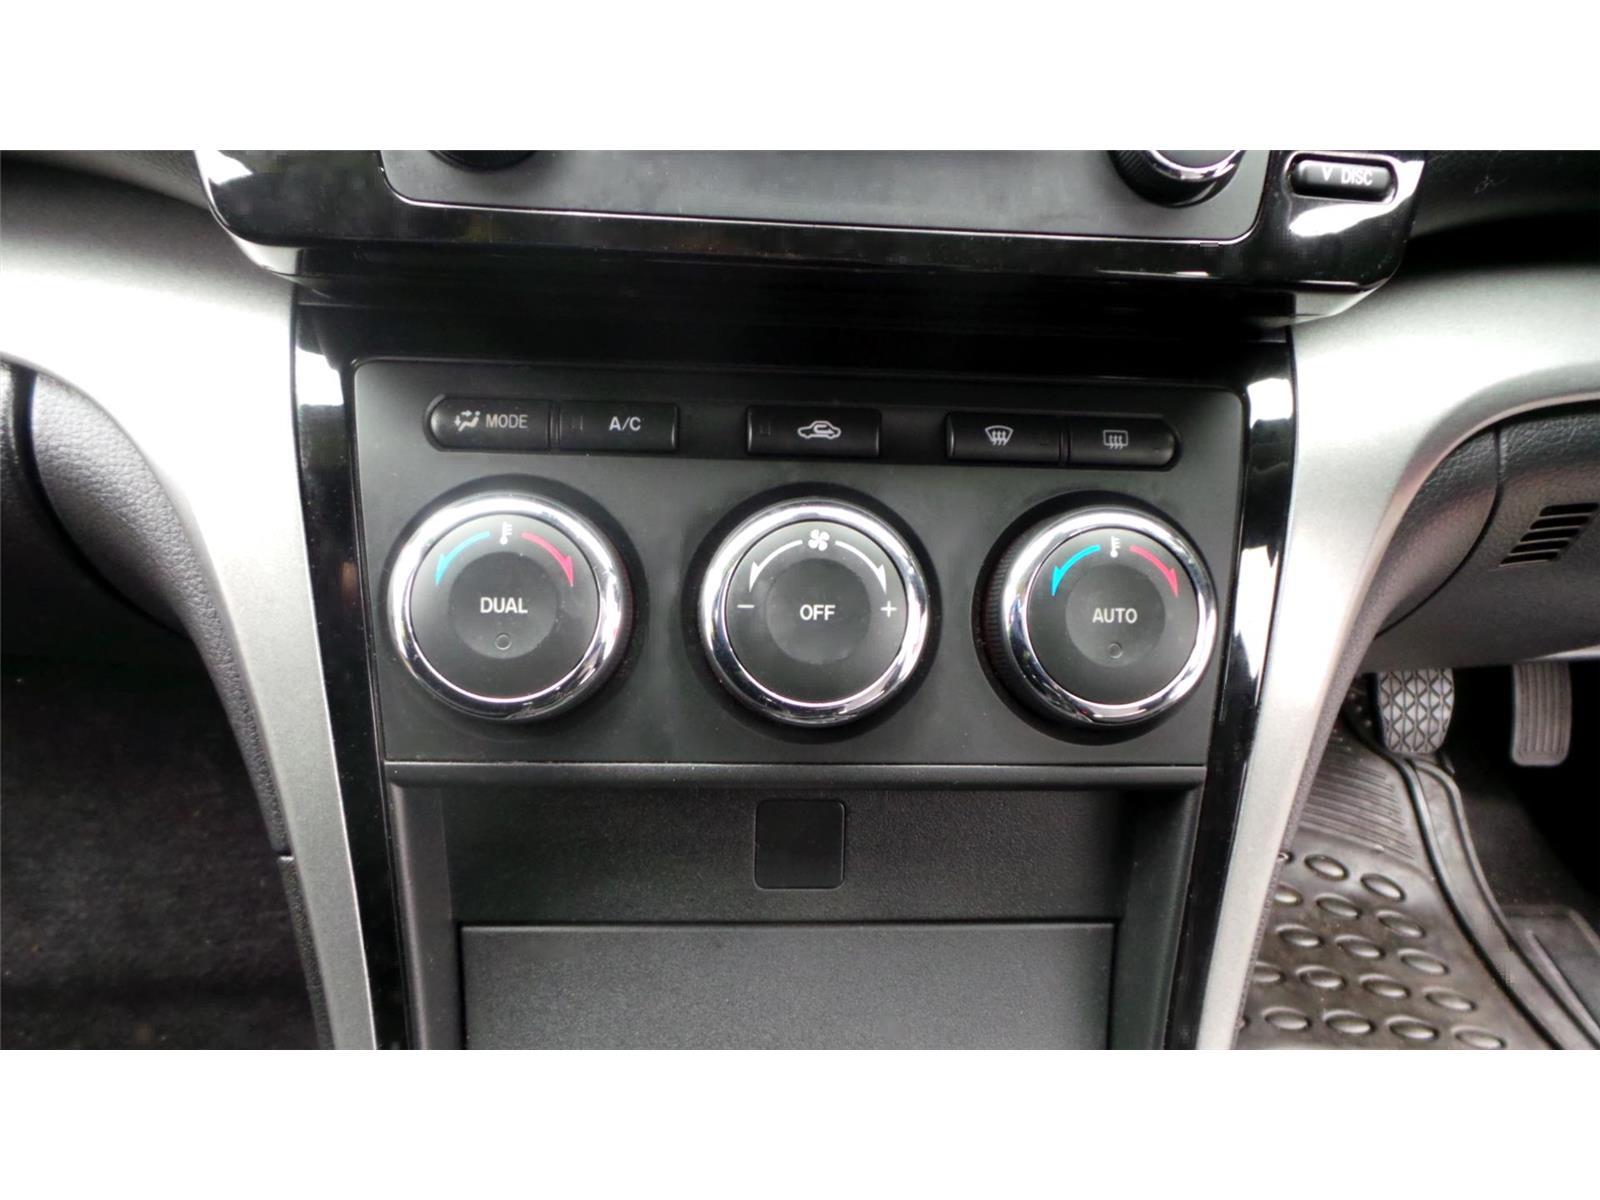 mazda 6 2008 to 2012 heater control assembly diesel manual for rh motorhog co uk 2014 mazda 6 user manual 2012 Mazda 2 Owners Manual